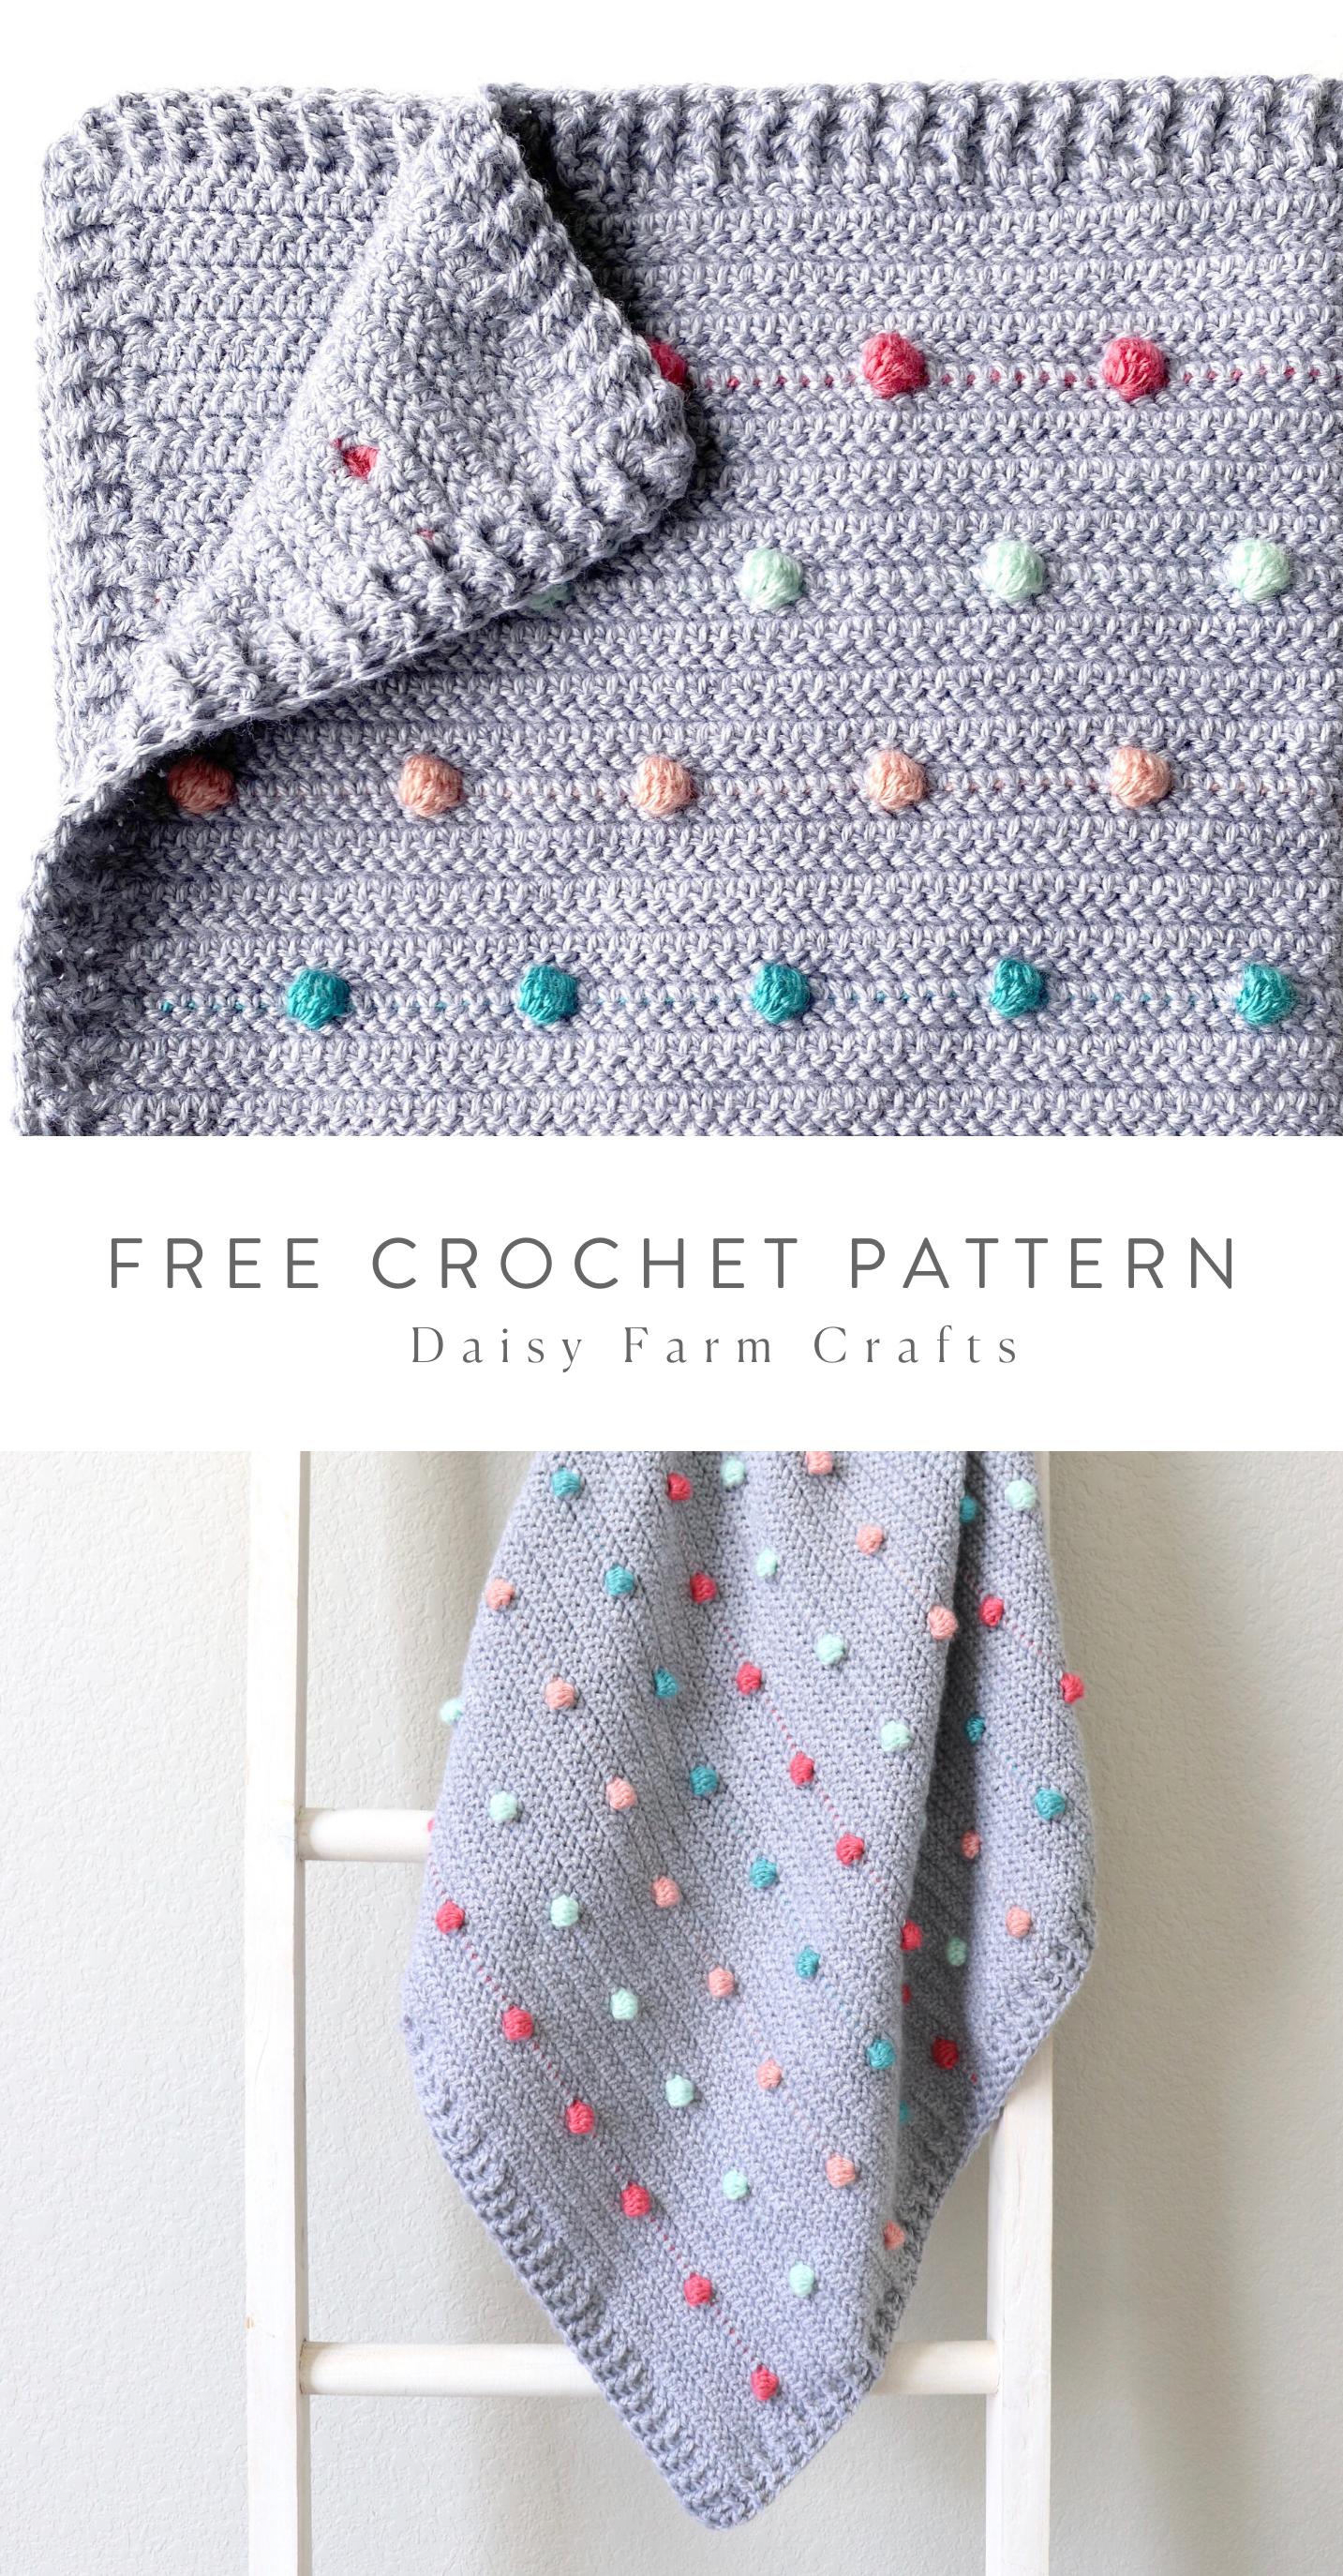 Free Pattern - Crochet Colorful Polka Dots Baby Blanket